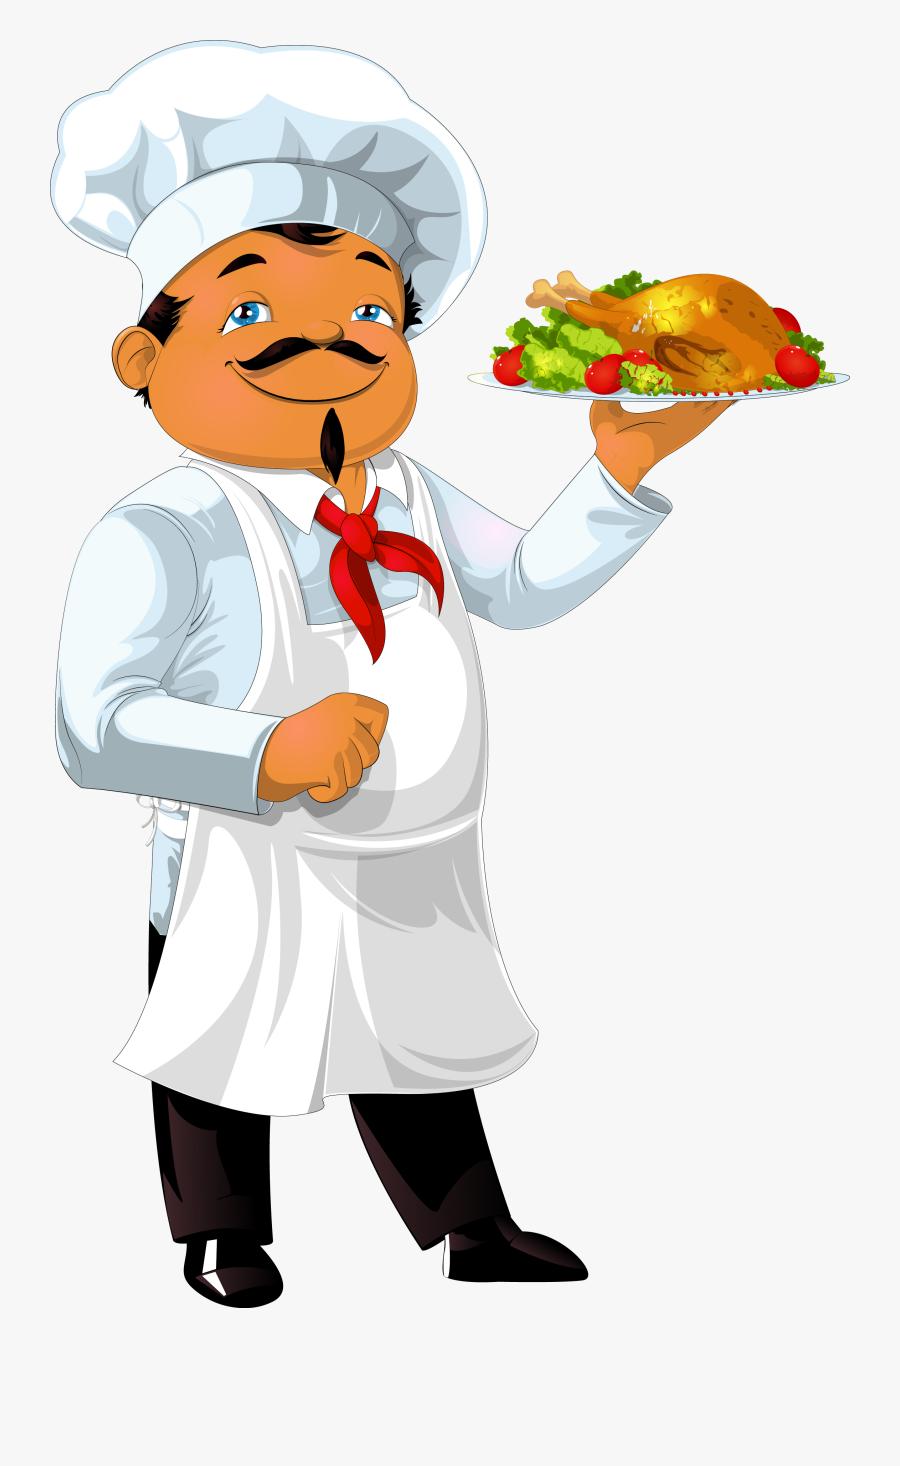 Indian Restaurants In Bangkok Cook - Imagen De Un Chef Animado, Transparent Clipart